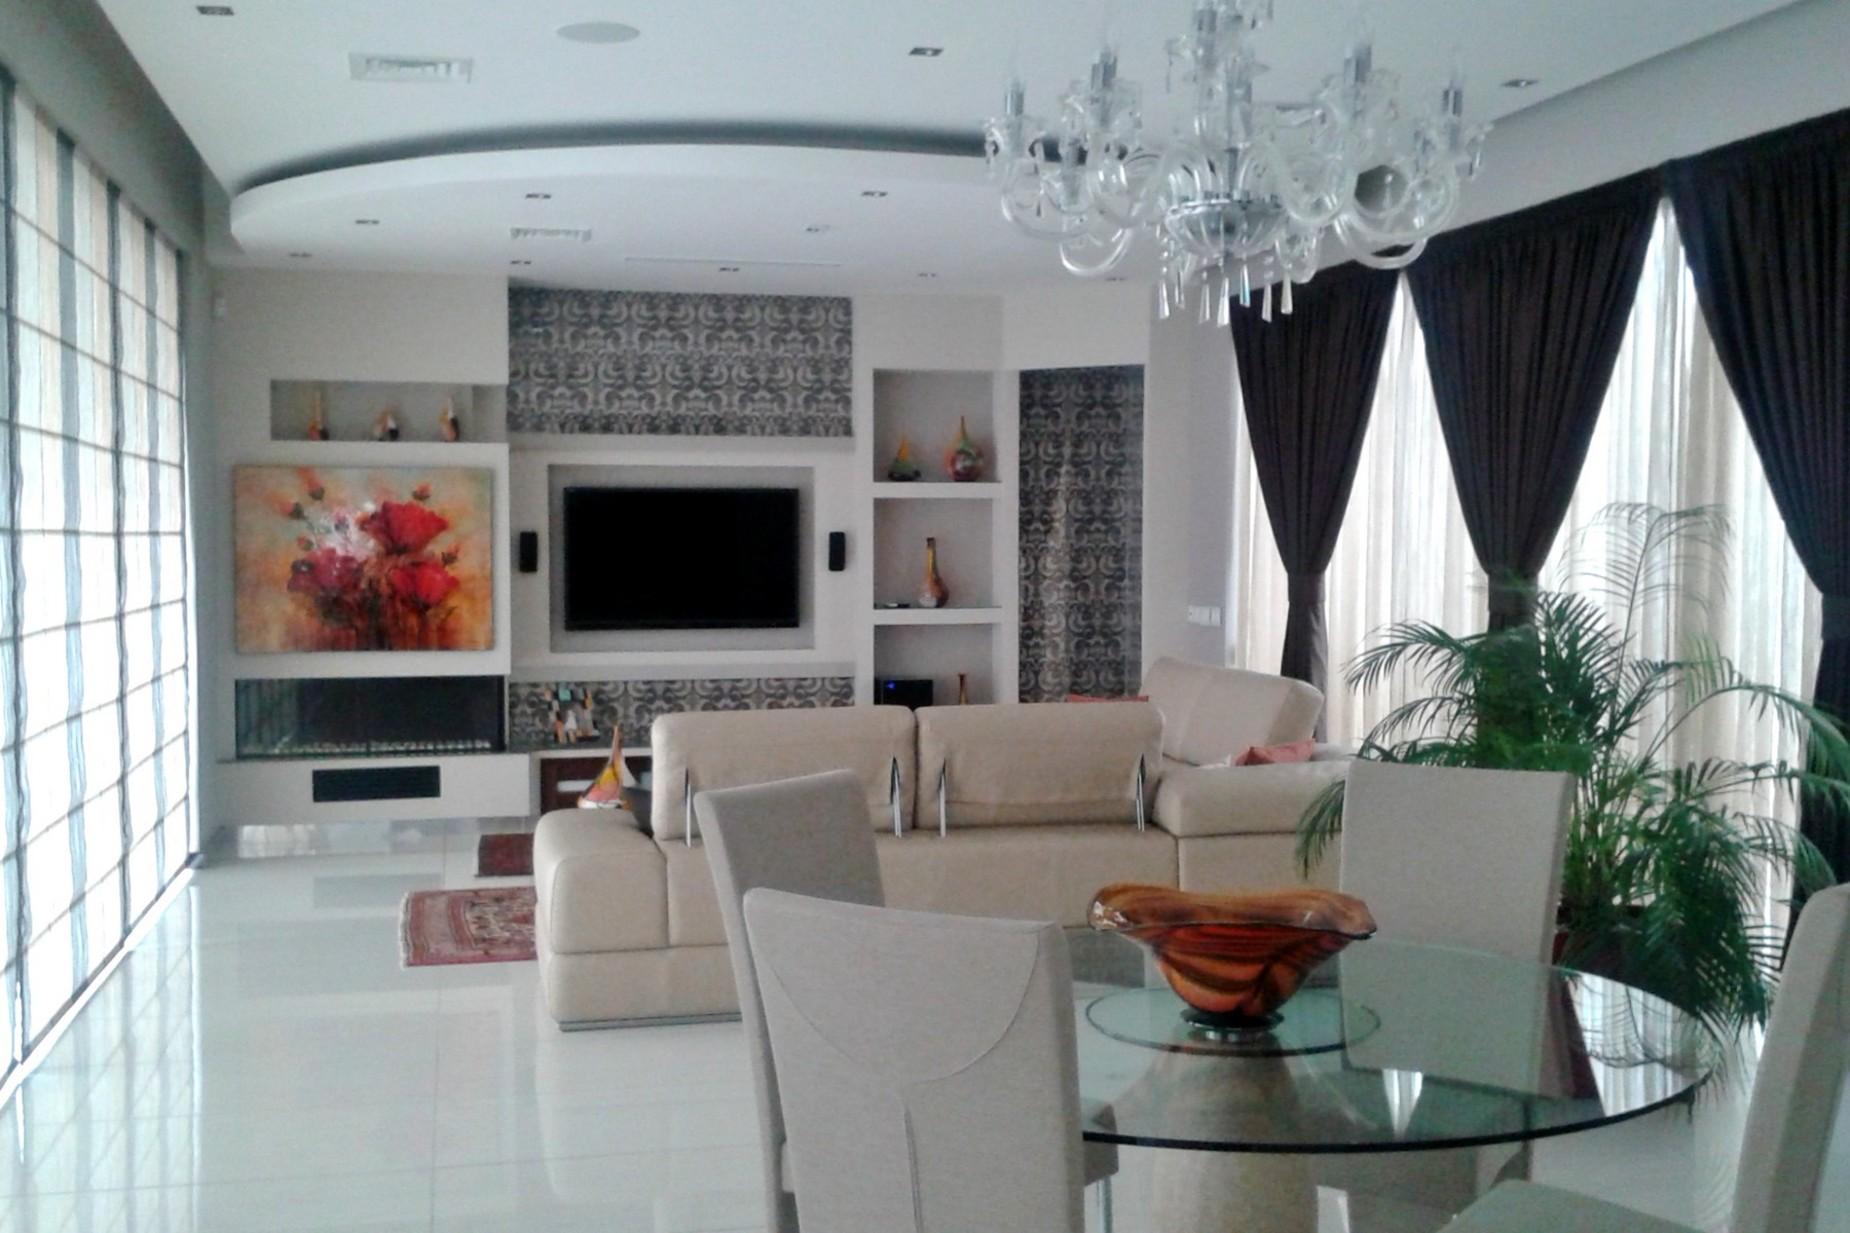 3 bed Villa For Sale in Marsascala, Marsascala - thumb 2